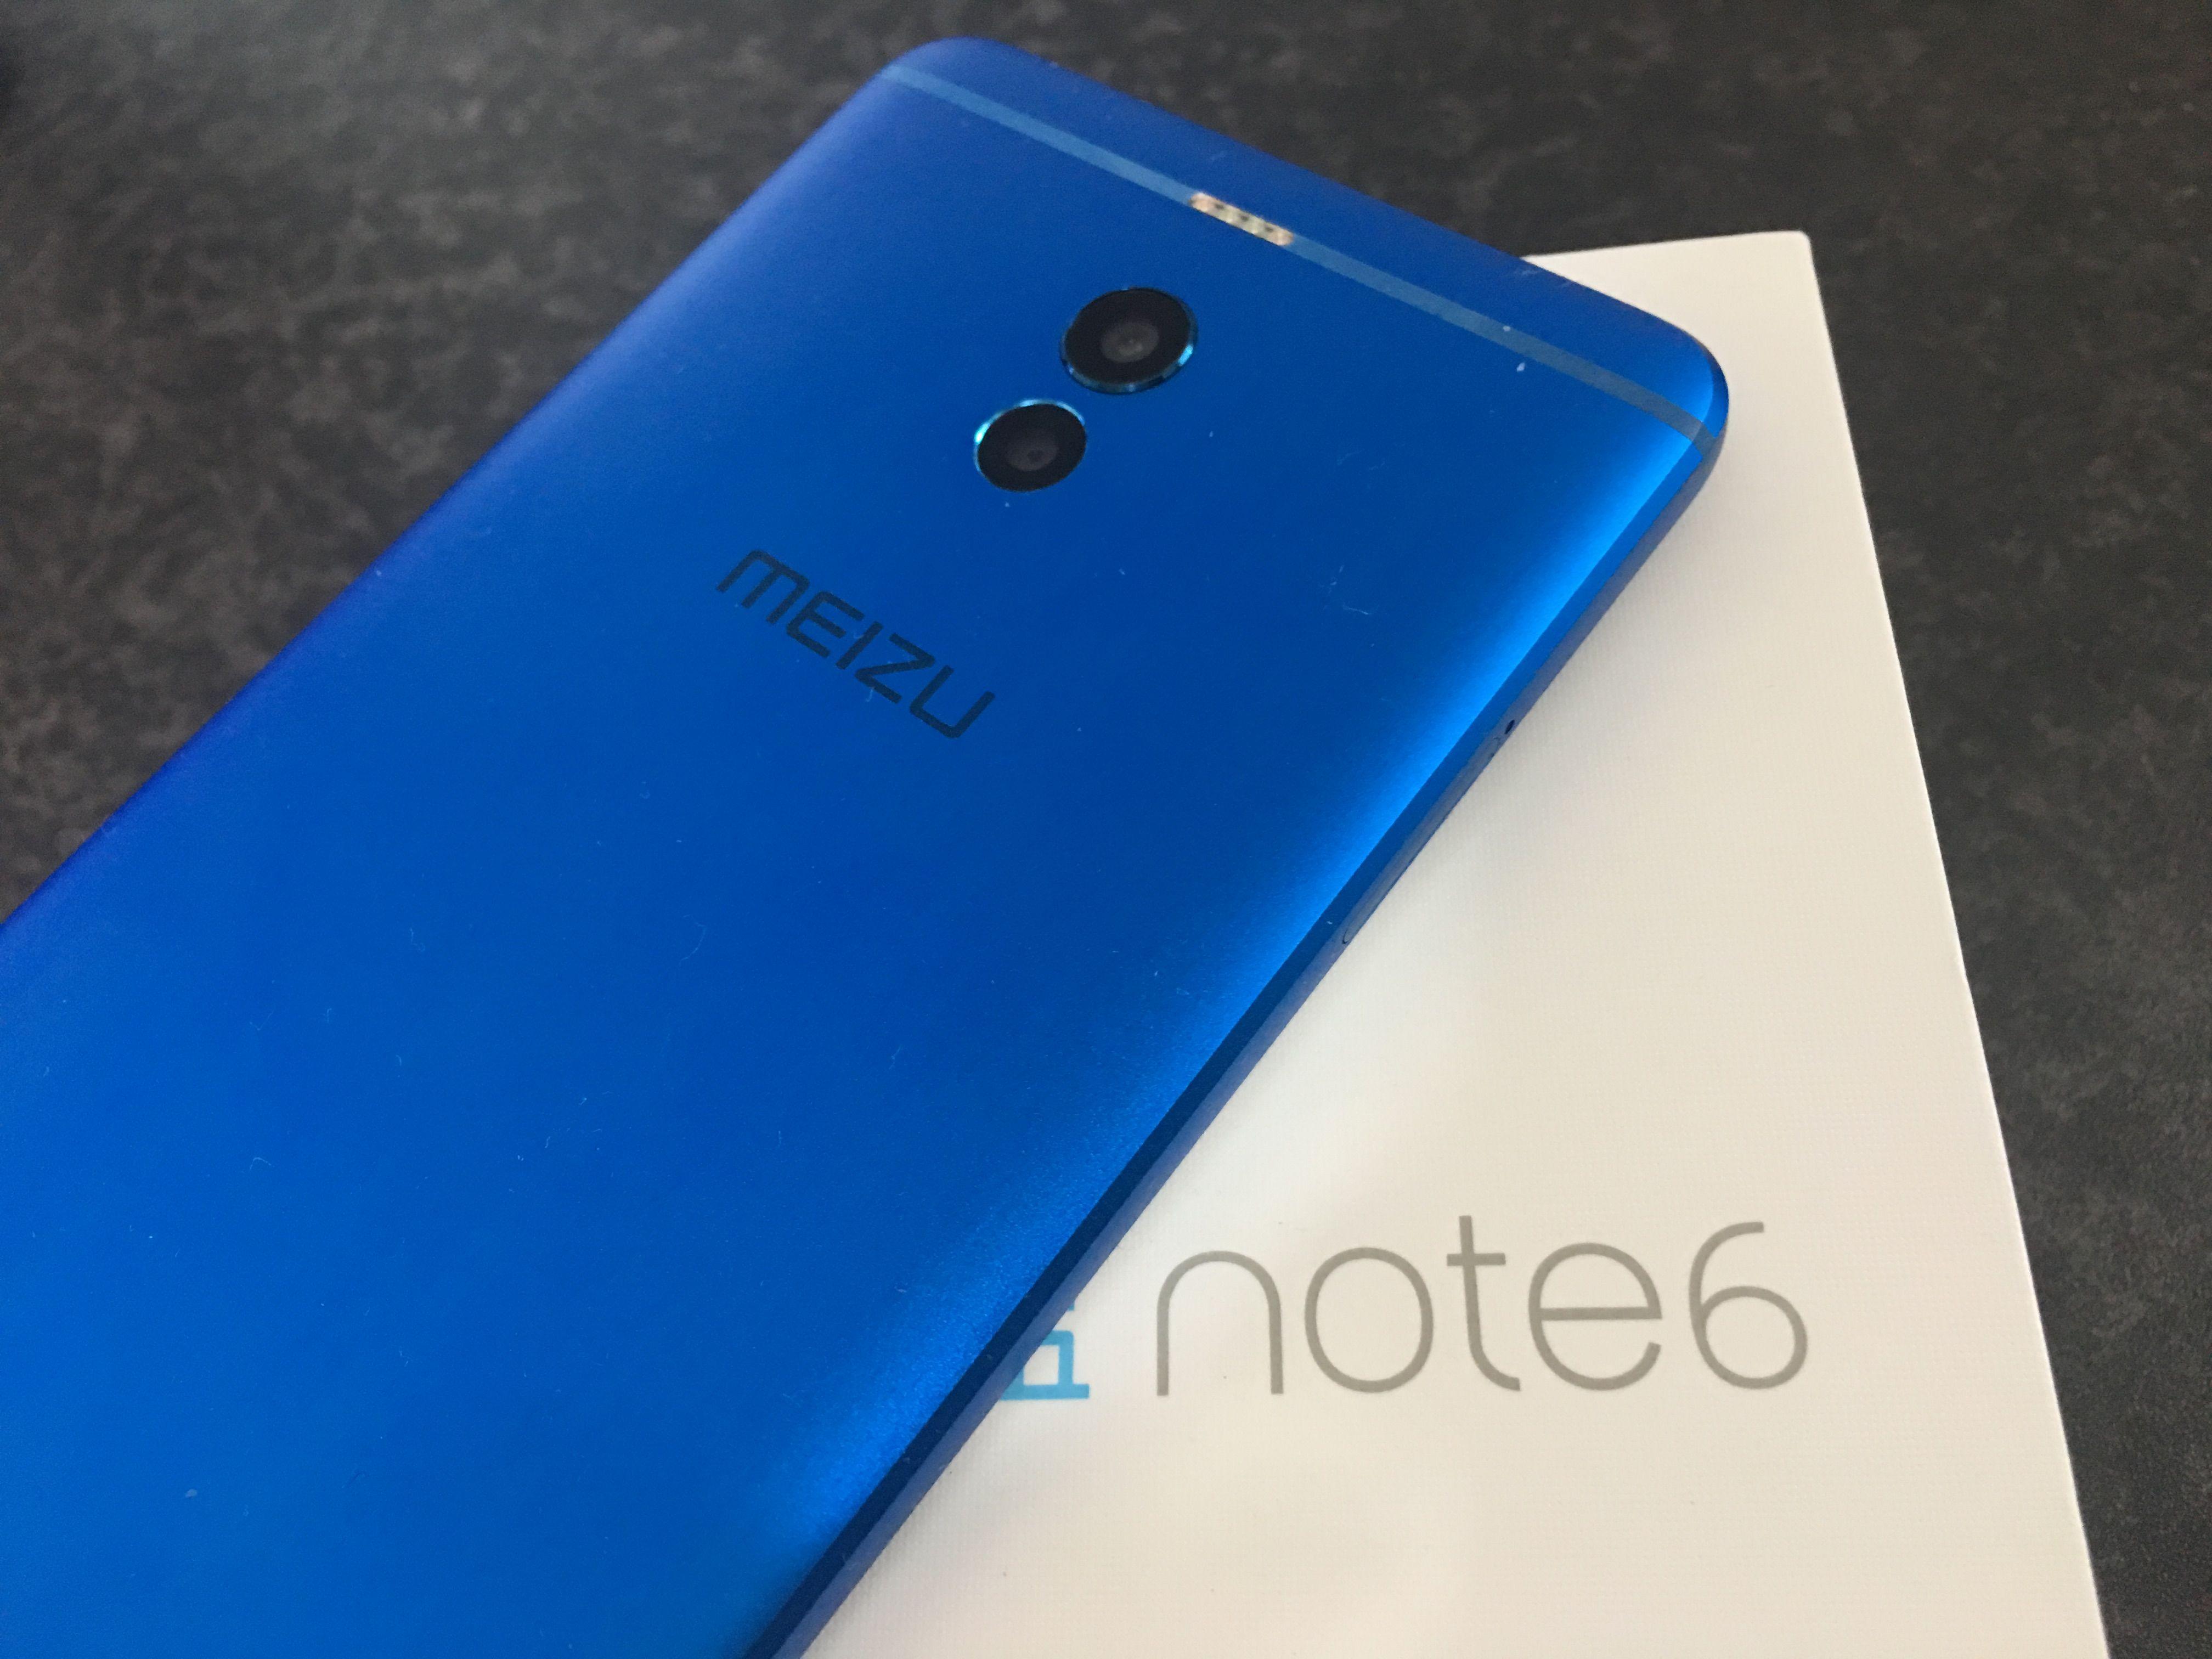 Meizu M6 NoteのBootloader Unlockを行う方法